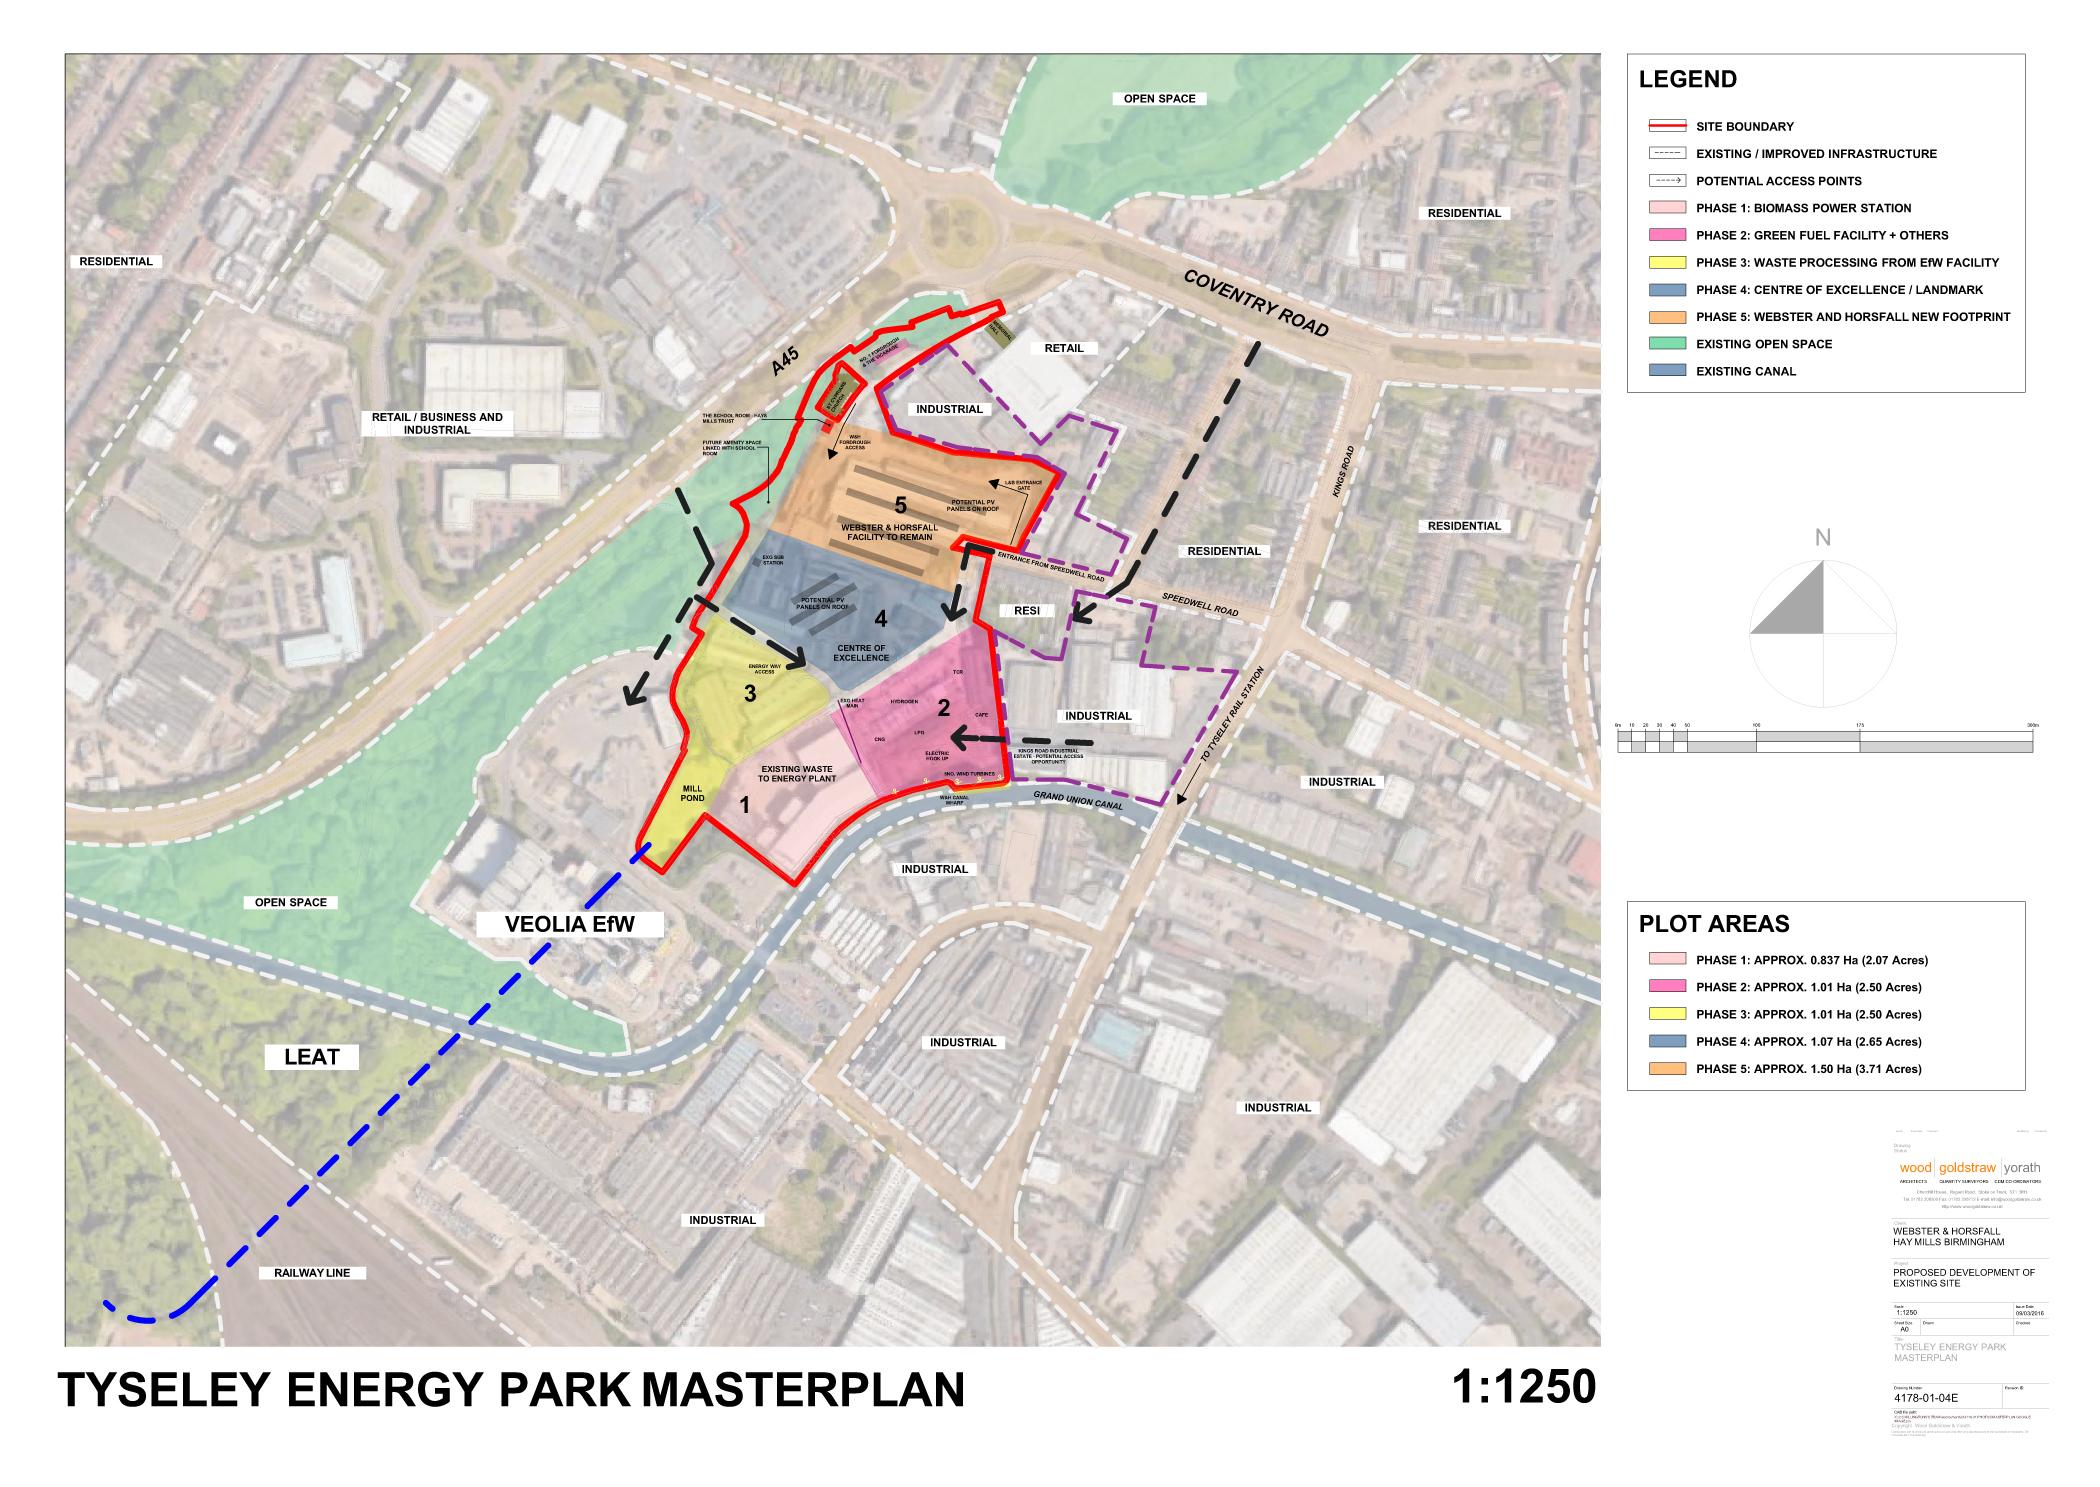 Tyseley-energy-park-masterplan